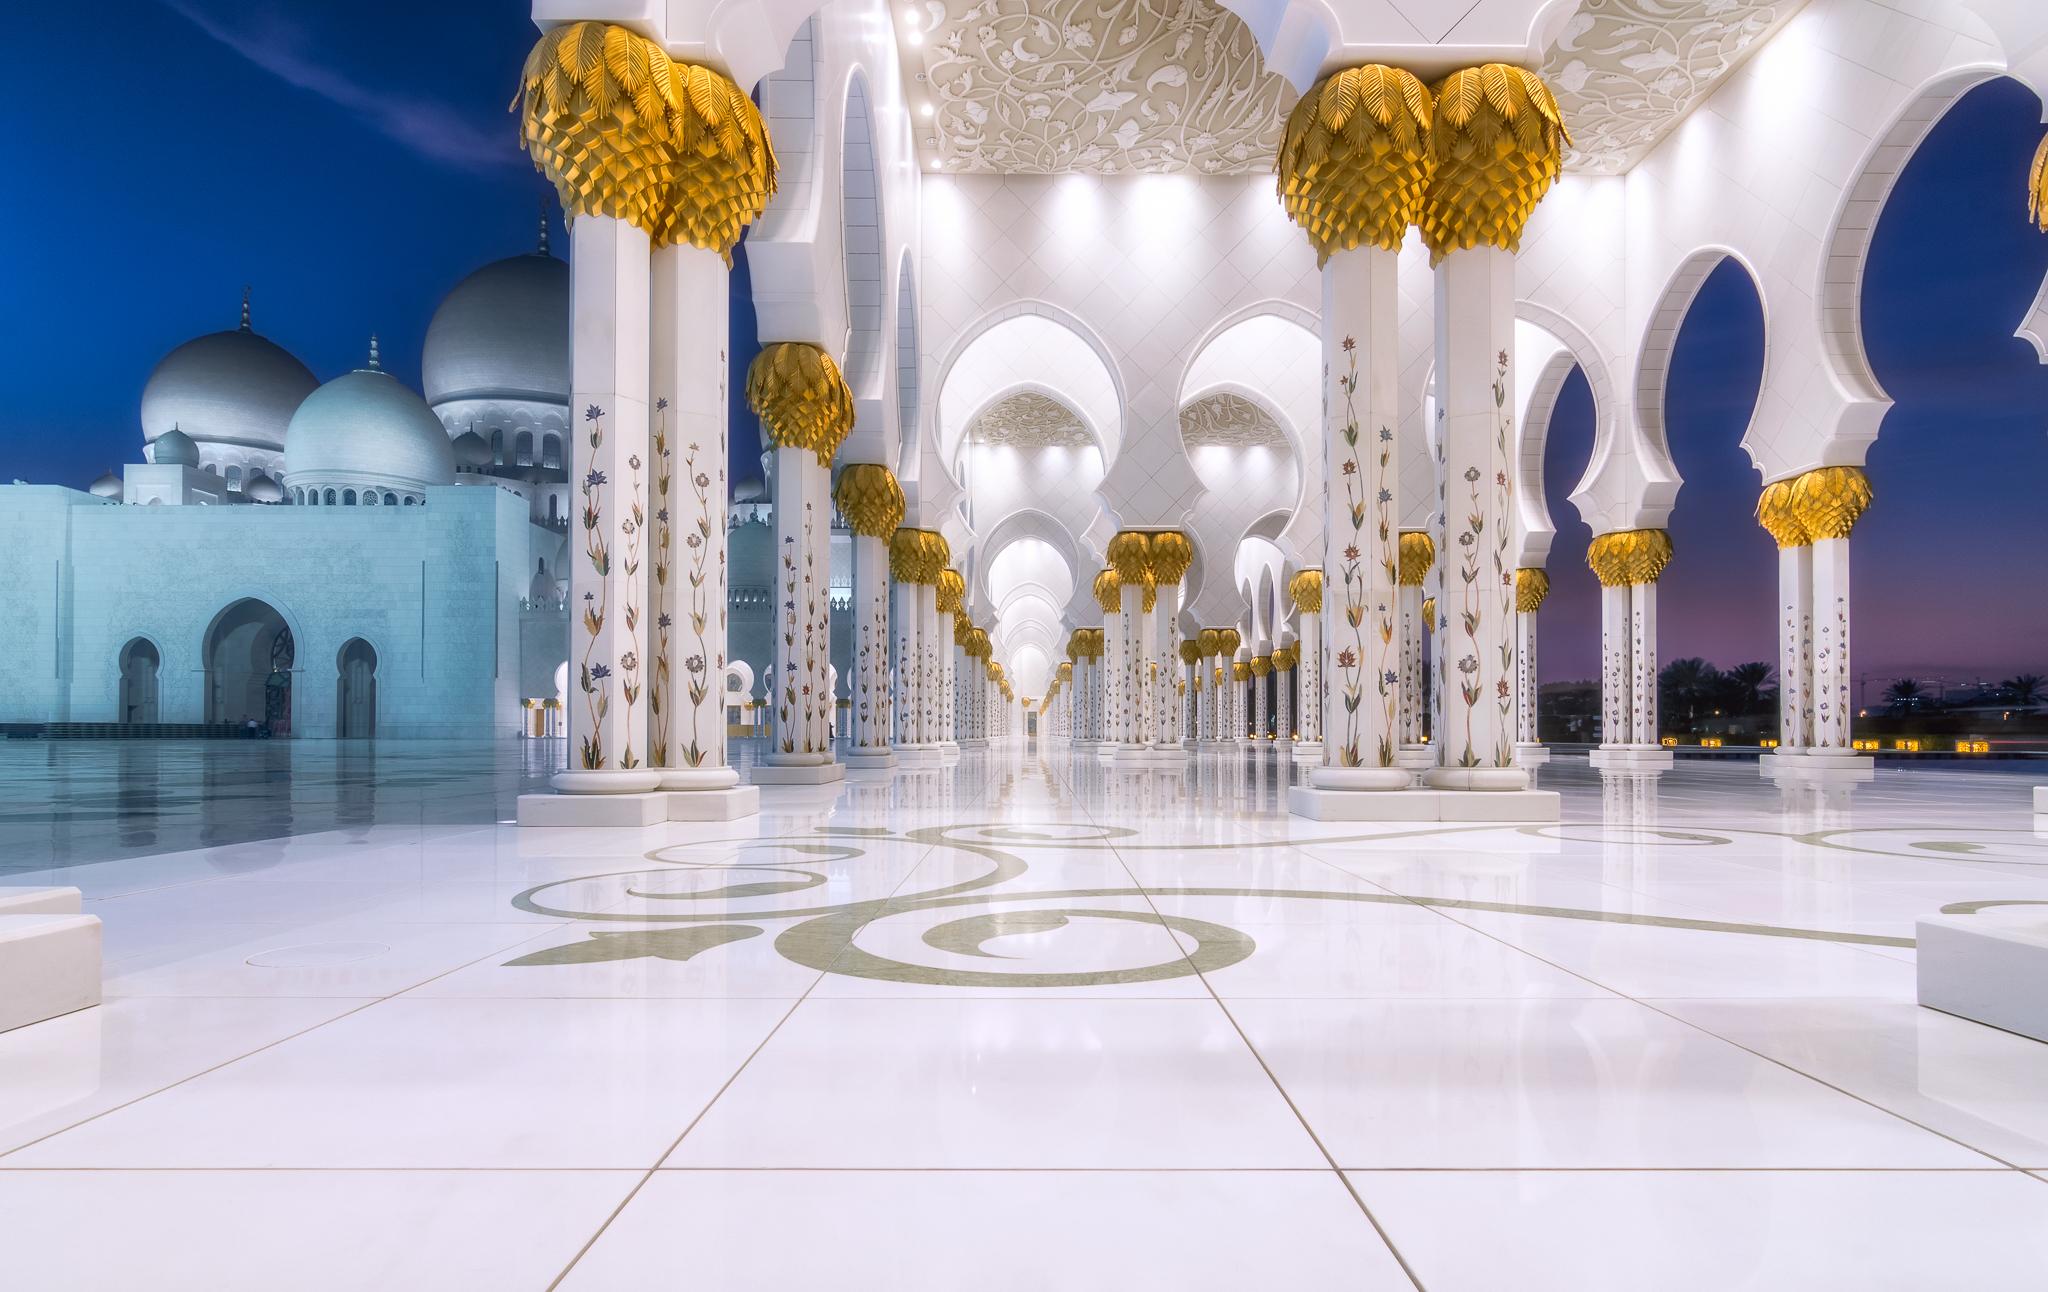 Grand Mosque Abu Dhabi, United Arab Emirates